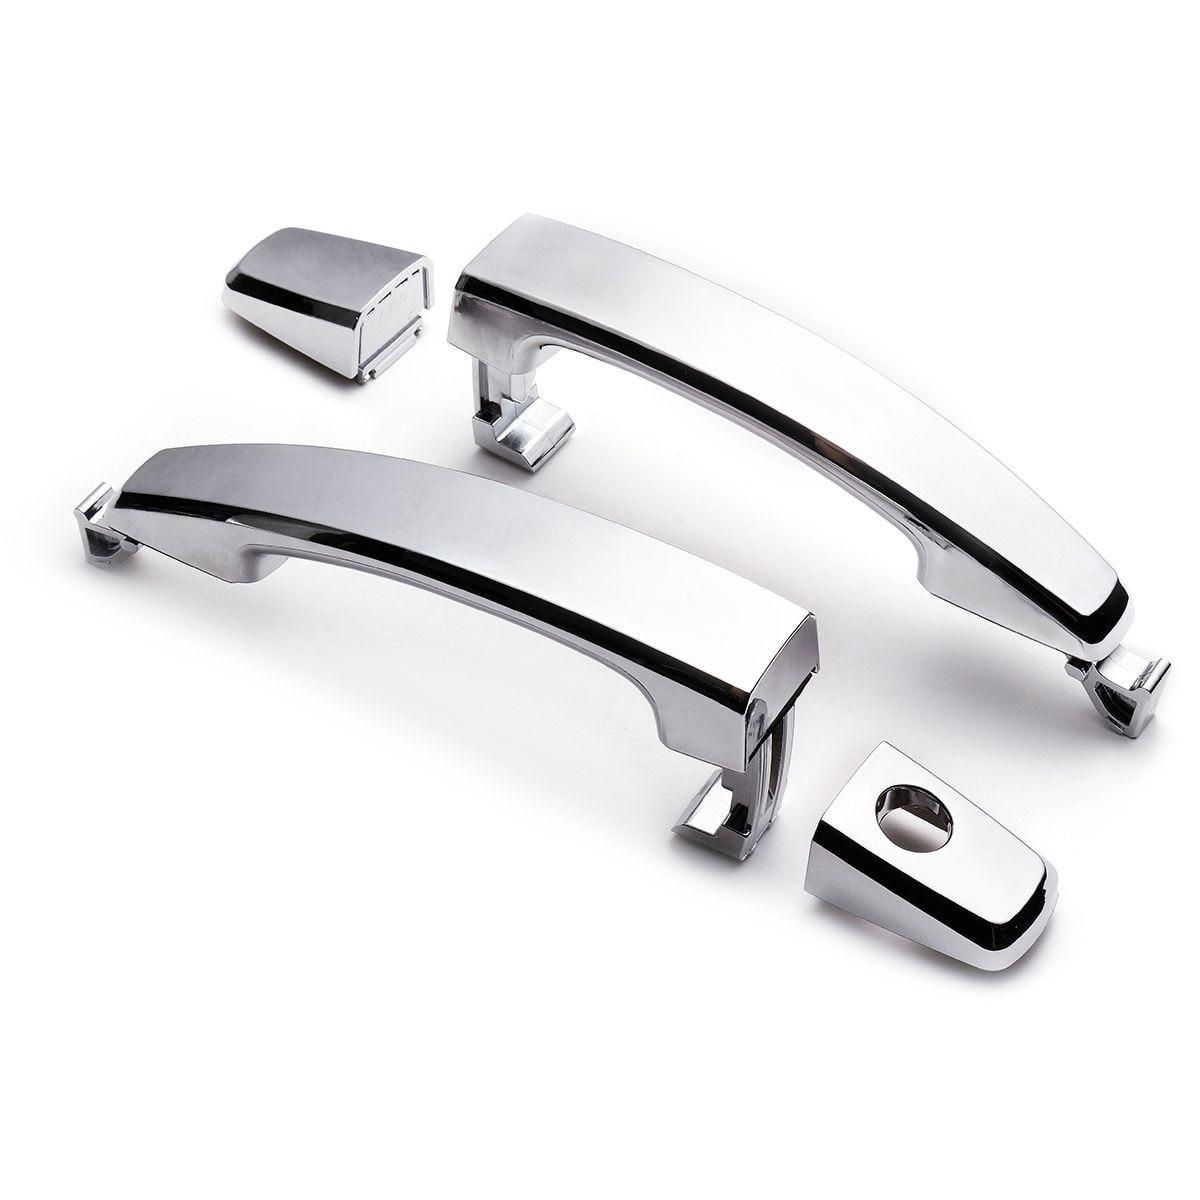 5X Rocker panel  fastening clips rommets for BMW e32 e36 e46 e87 e90 etc.